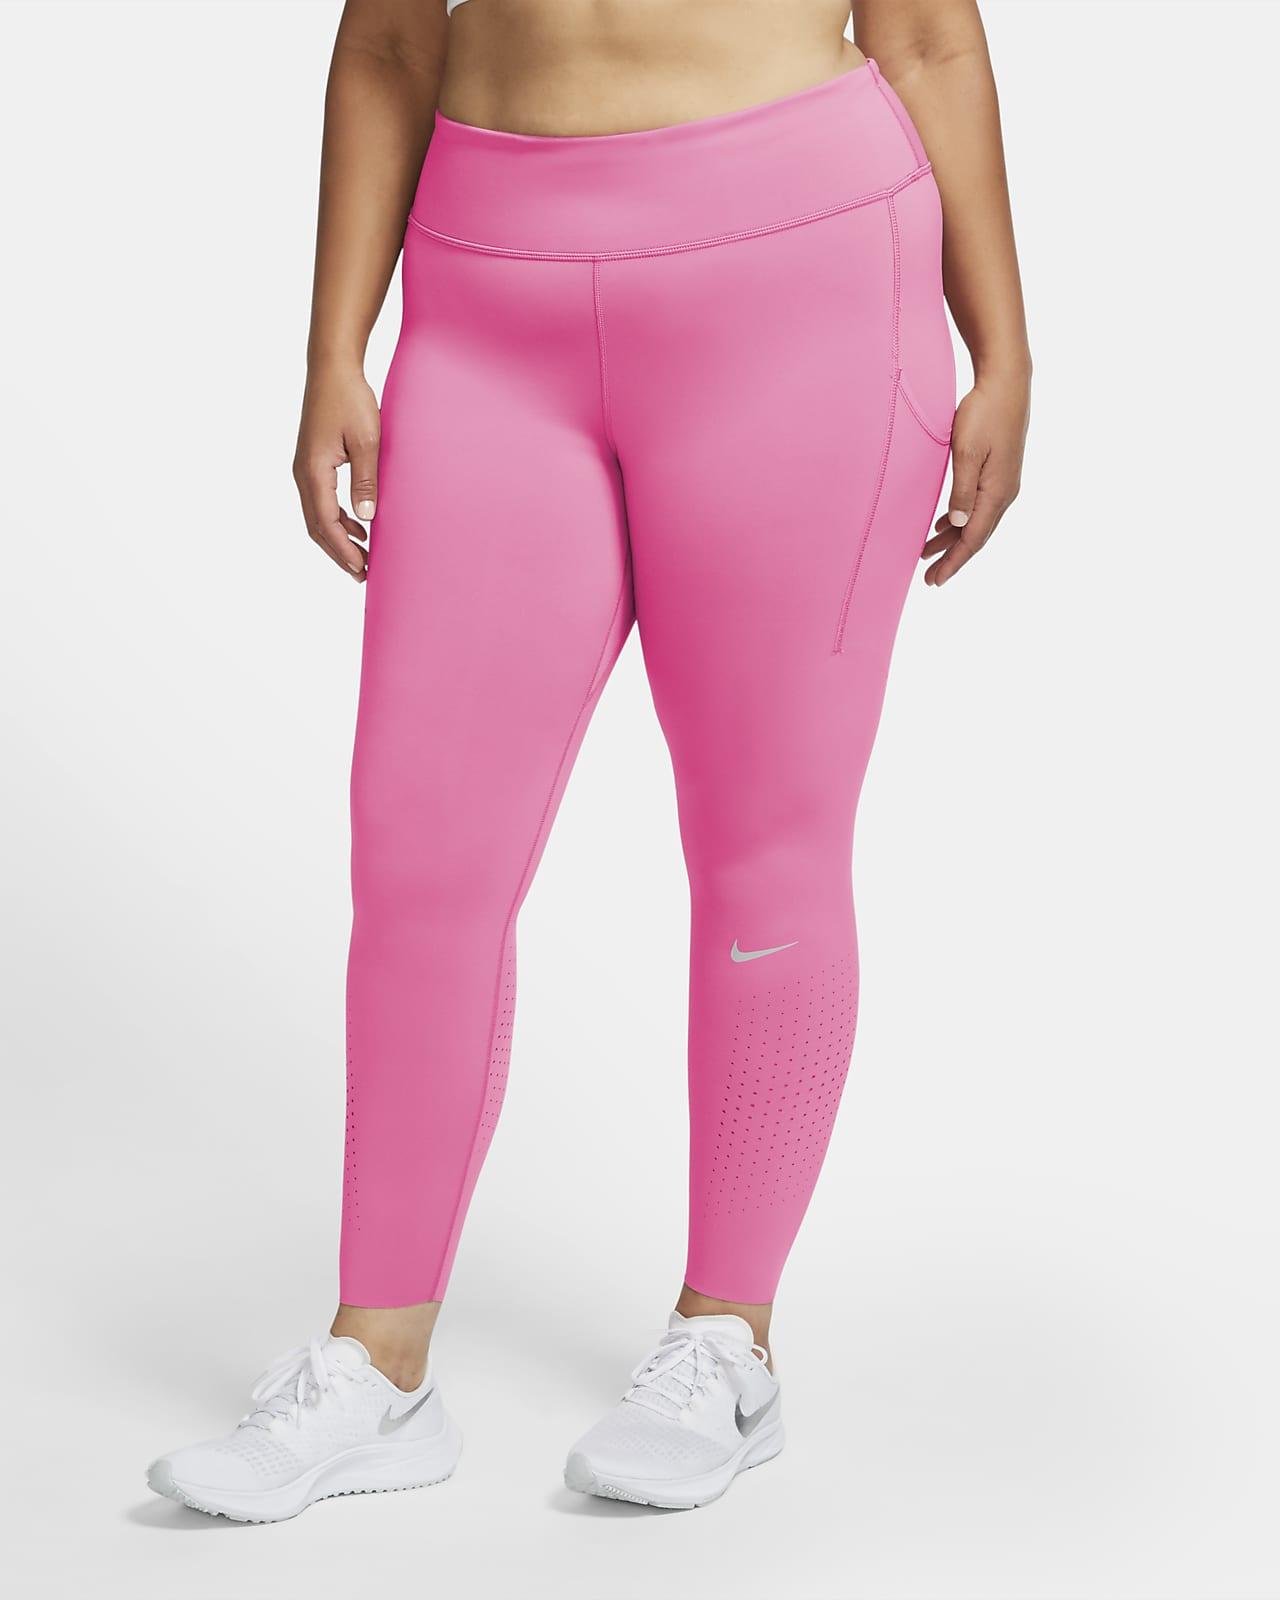 Nike Epic Luxe Leggings de running de talle medio con bolsillos (Talla grande) - Mujer